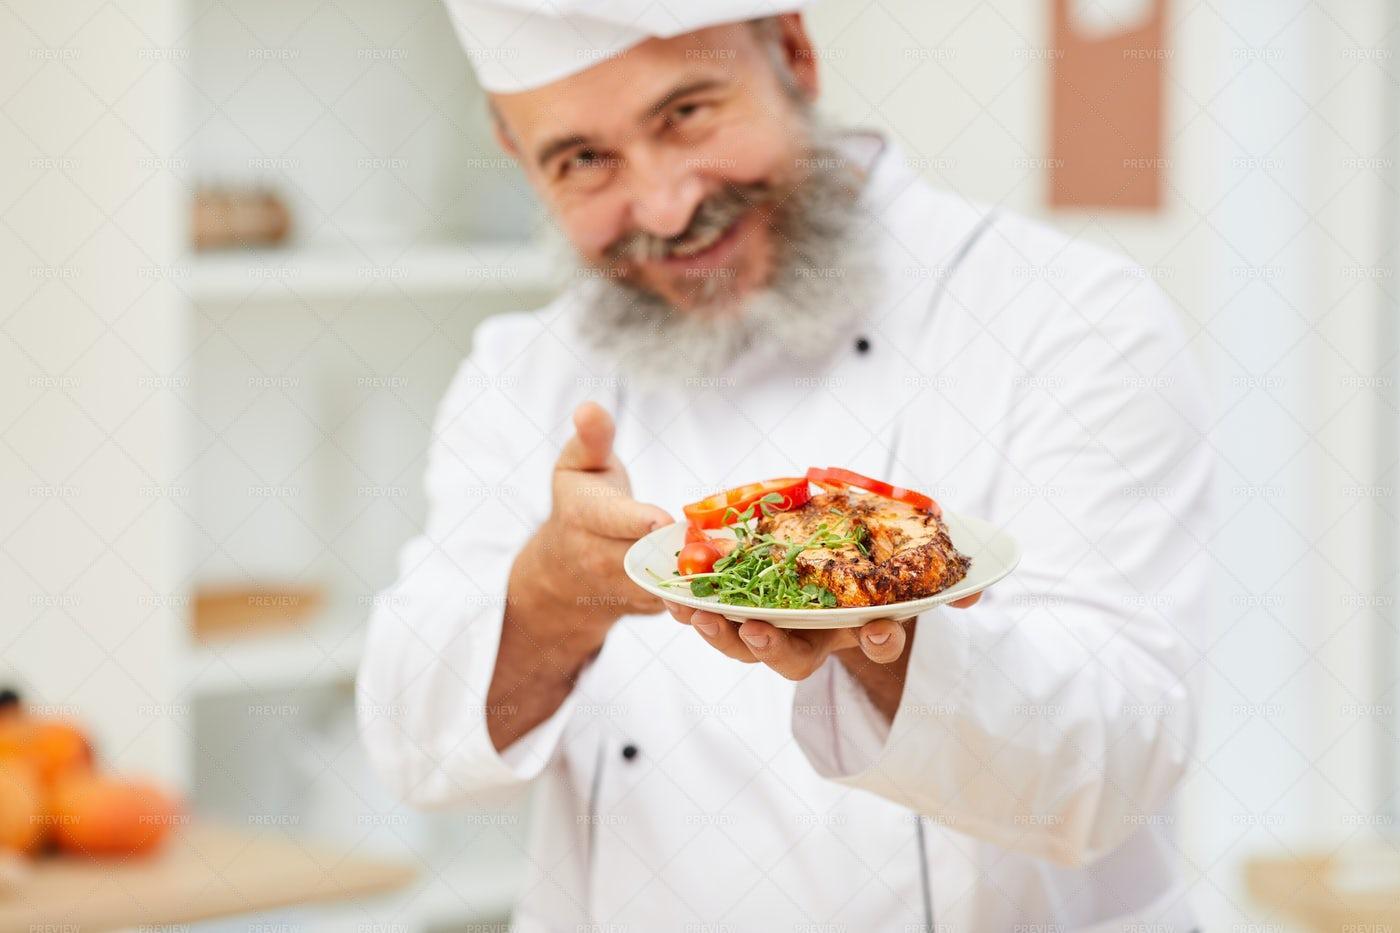 Senior Chef Presenting Steak: Stock Photos